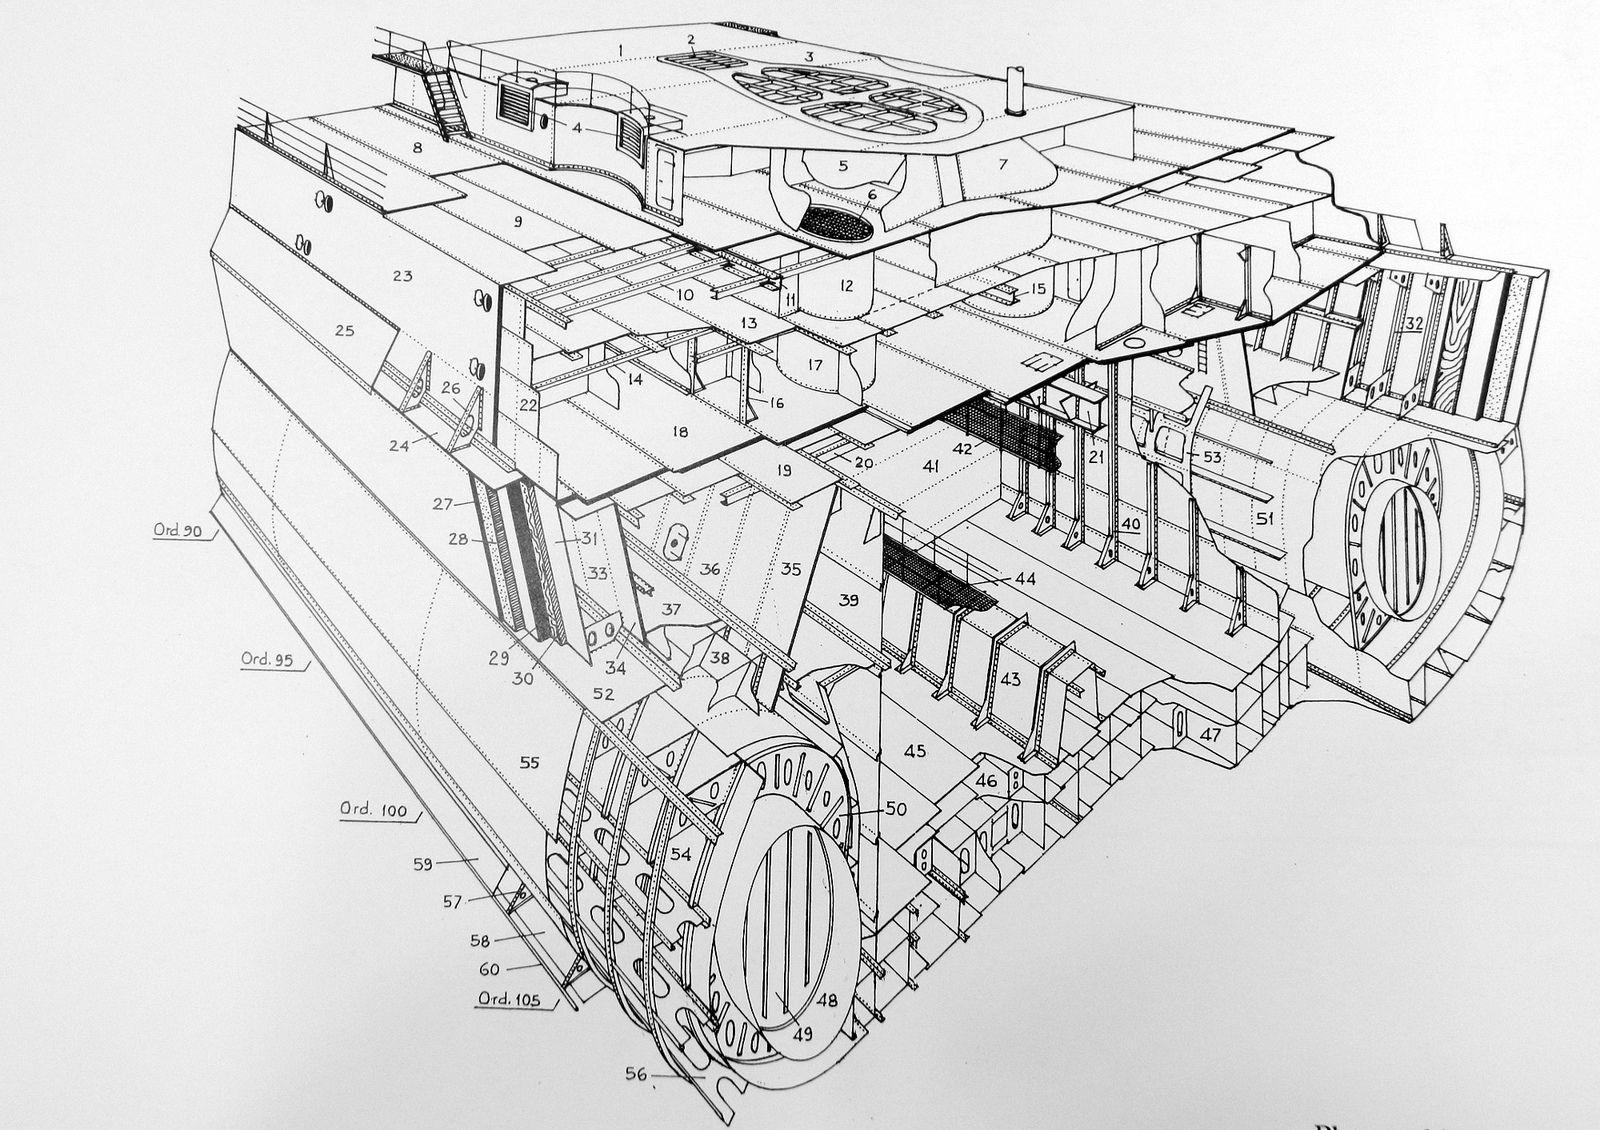 Pin by Daryl Carpenter on Ship Schematics  Cutaways